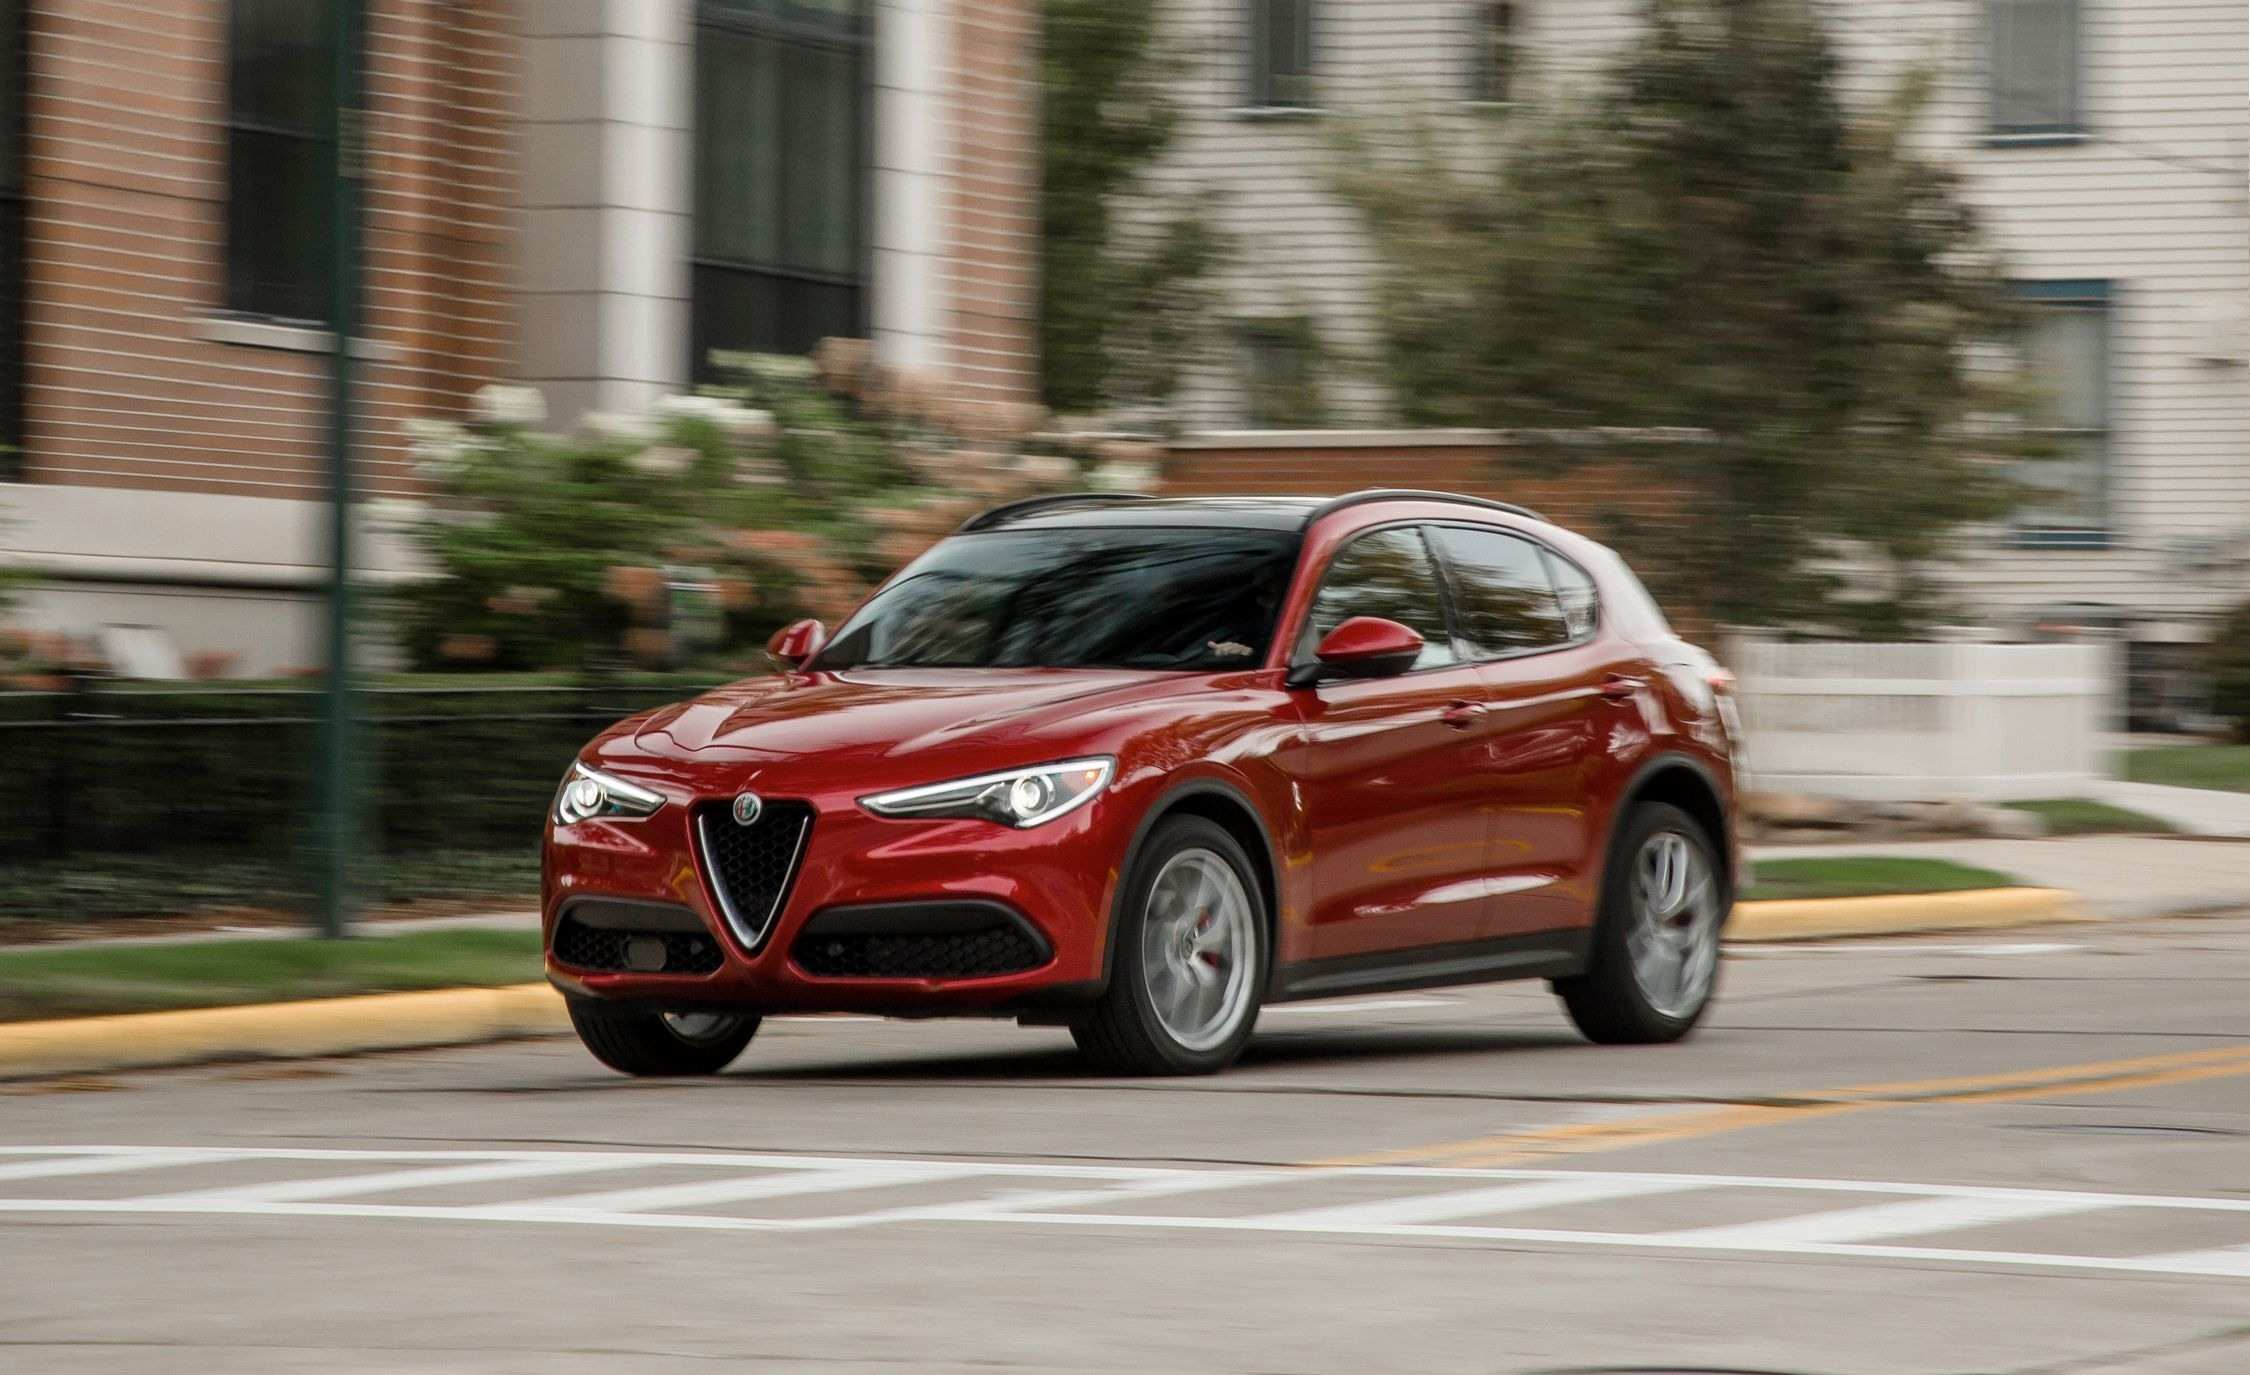 20 Great 2019 Alfa Romeo Stelvio Release Date First Drive with 2019 Alfa Romeo Stelvio Release Date